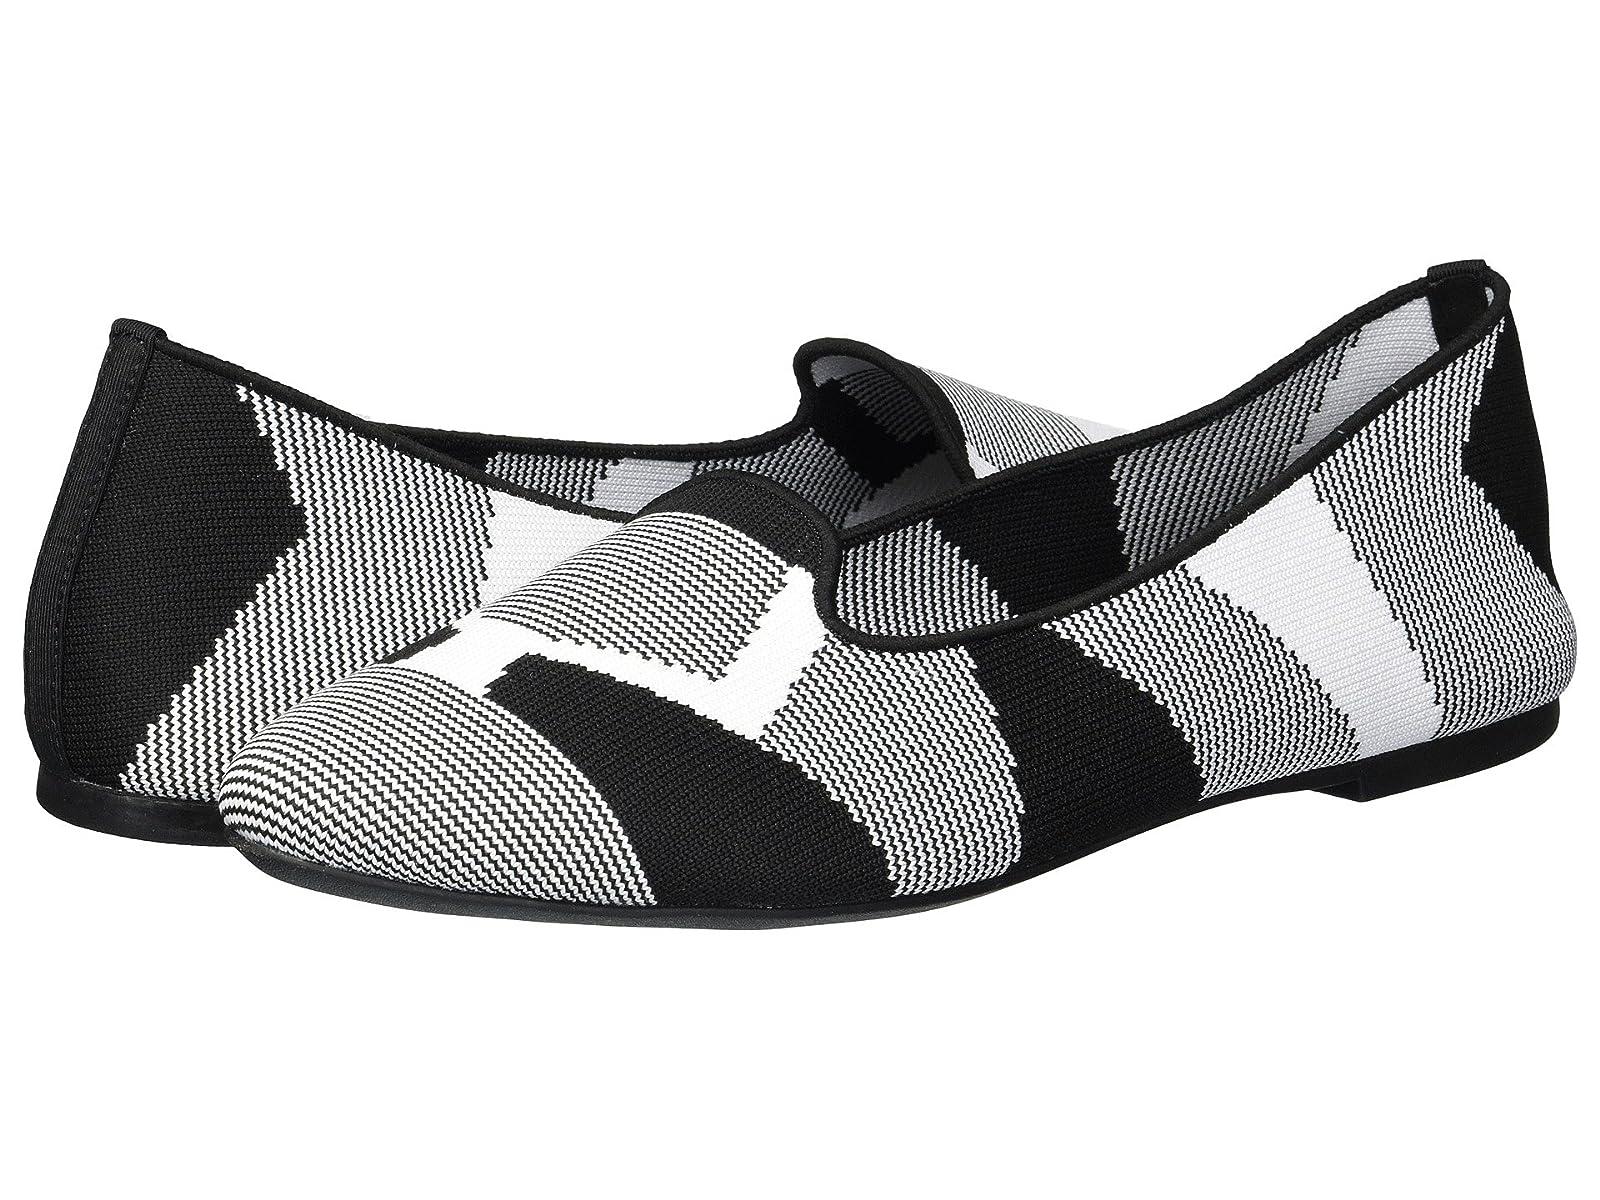 SKECHERS Cleo SherlockAtmospheric grades have affordable shoes